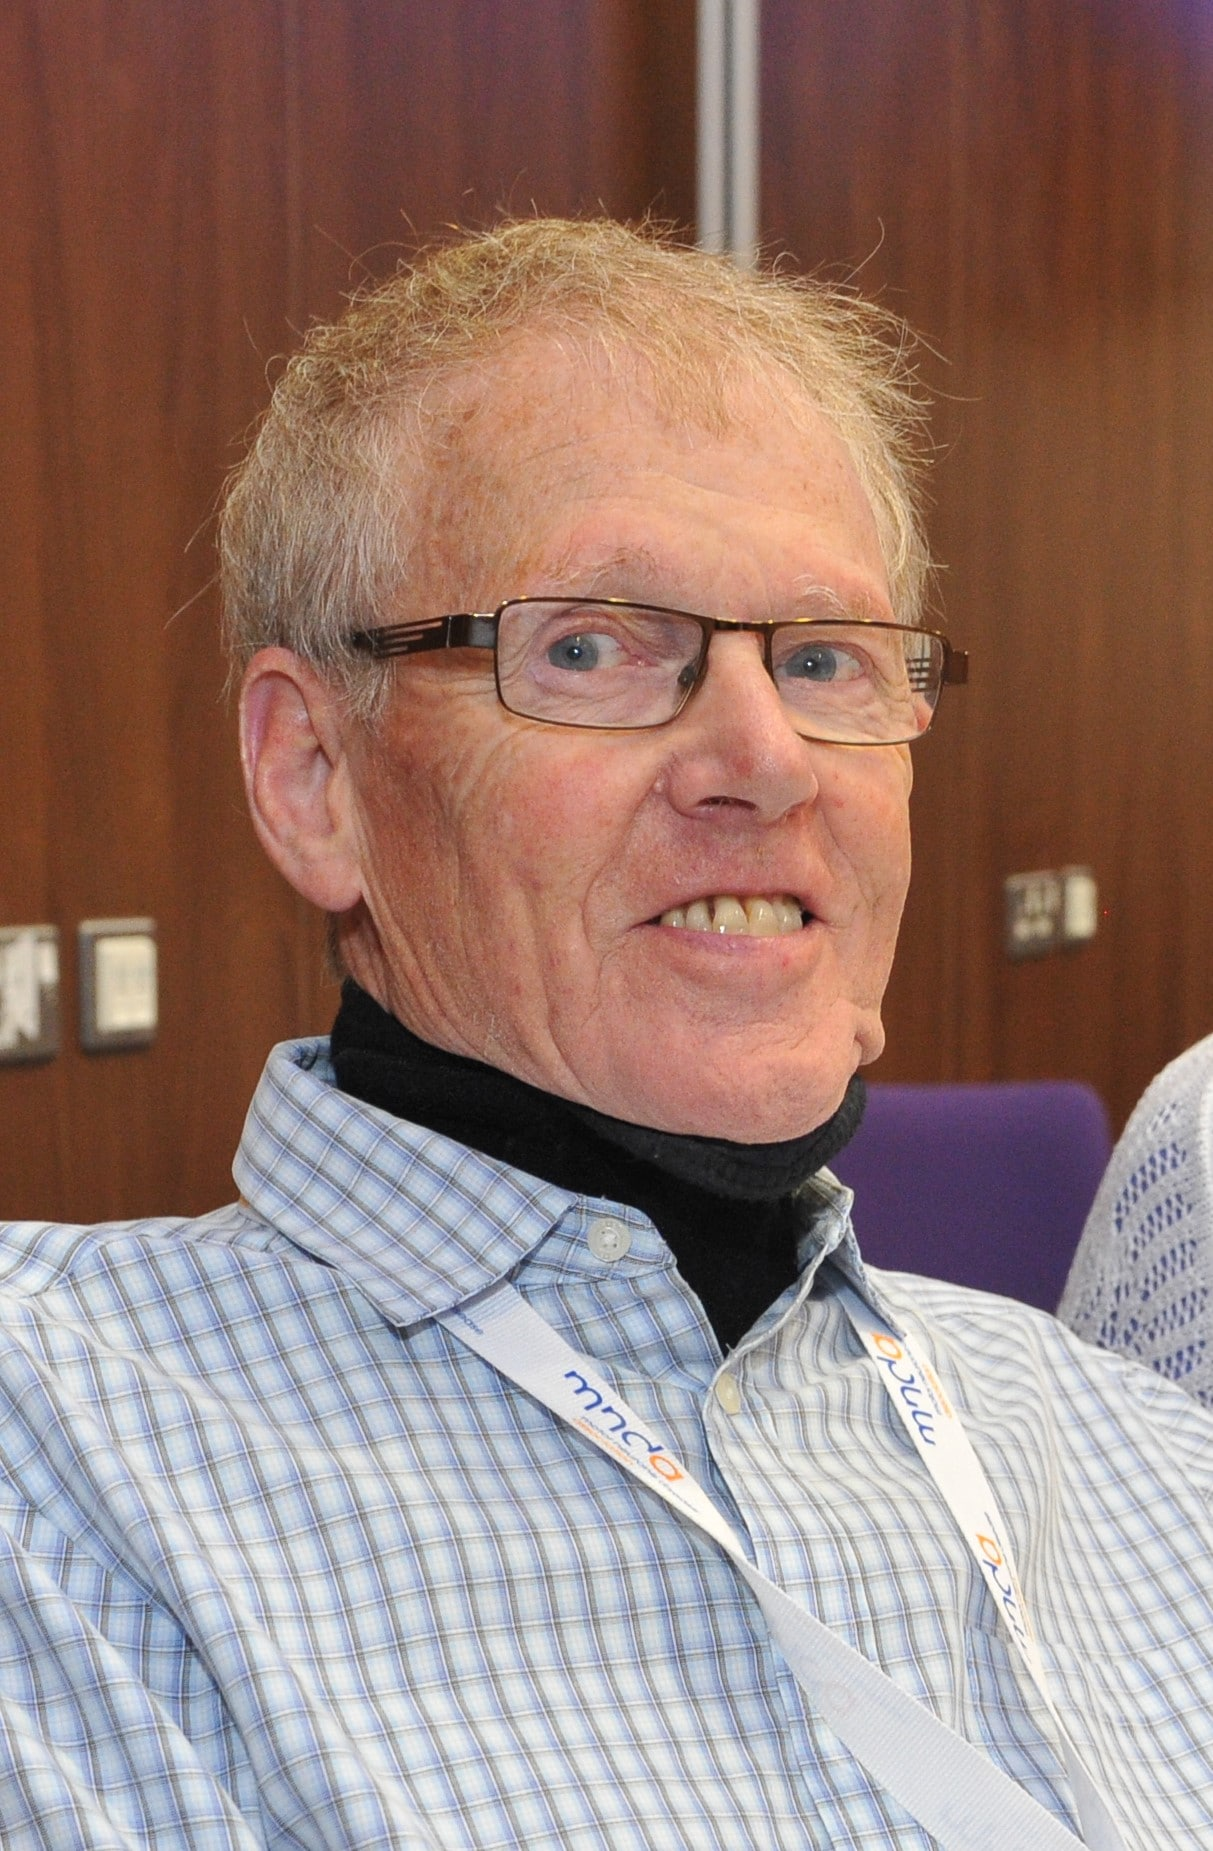 Philip Brindle, MND Association, Diagnosed 2015, England